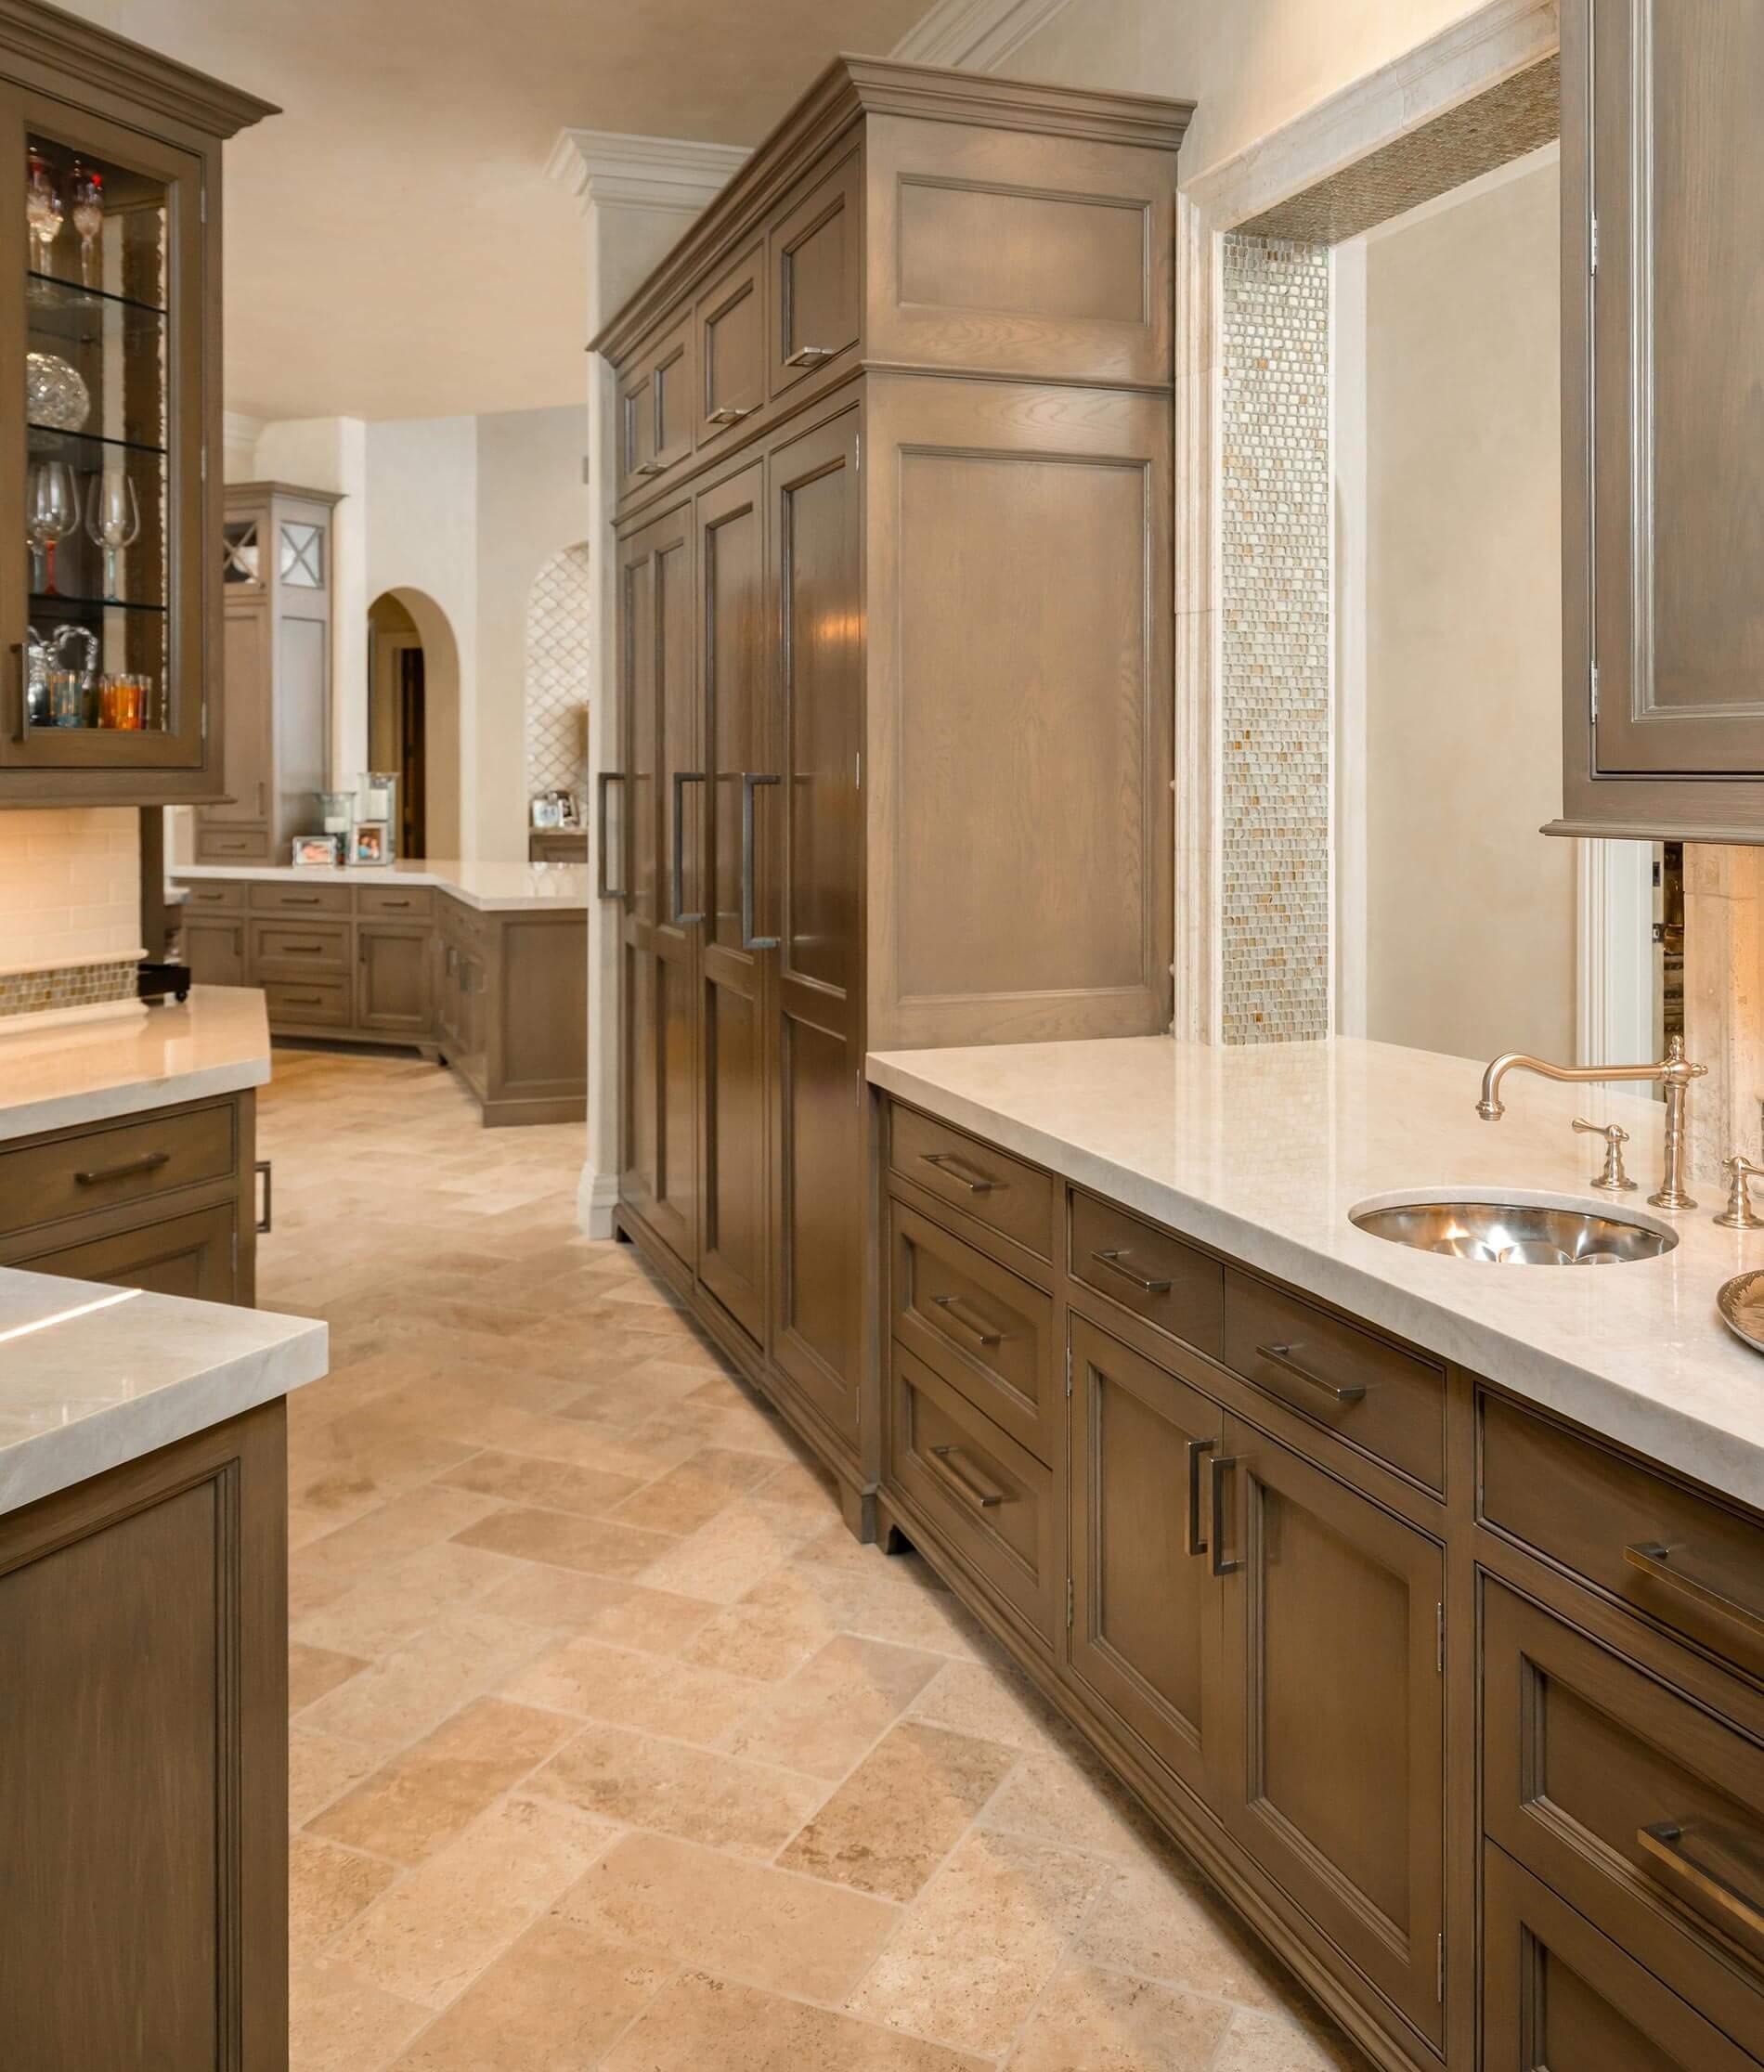 sims custom kitchen design